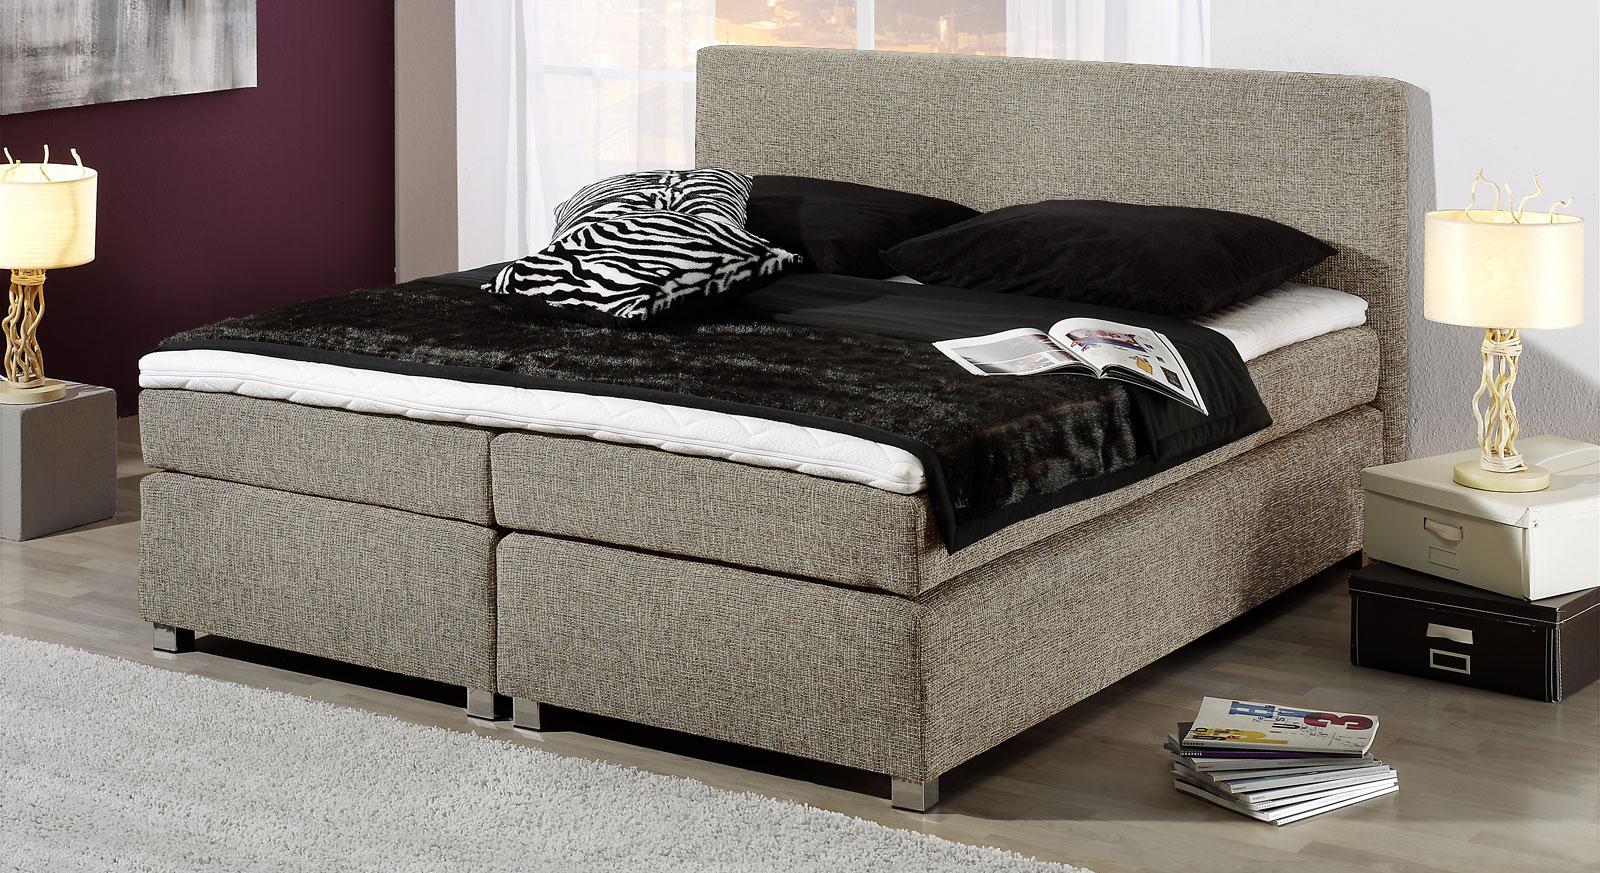 boxspring bettgestell mit kaltschaum topper melbourne. Black Bedroom Furniture Sets. Home Design Ideas